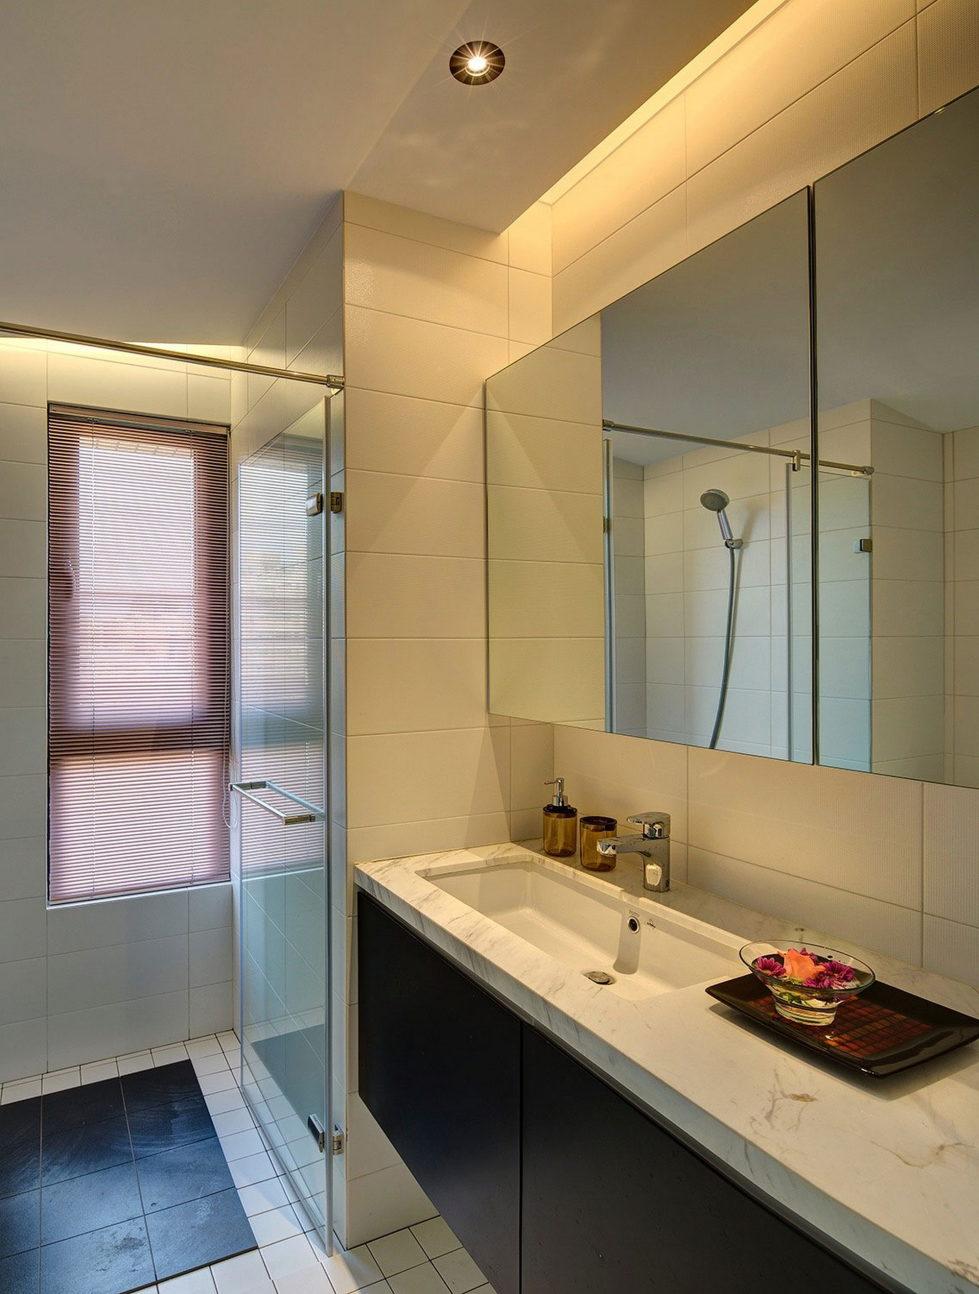 Wood Box Apartments From Cloud Pen Studio In Taichung, Taiwan 36